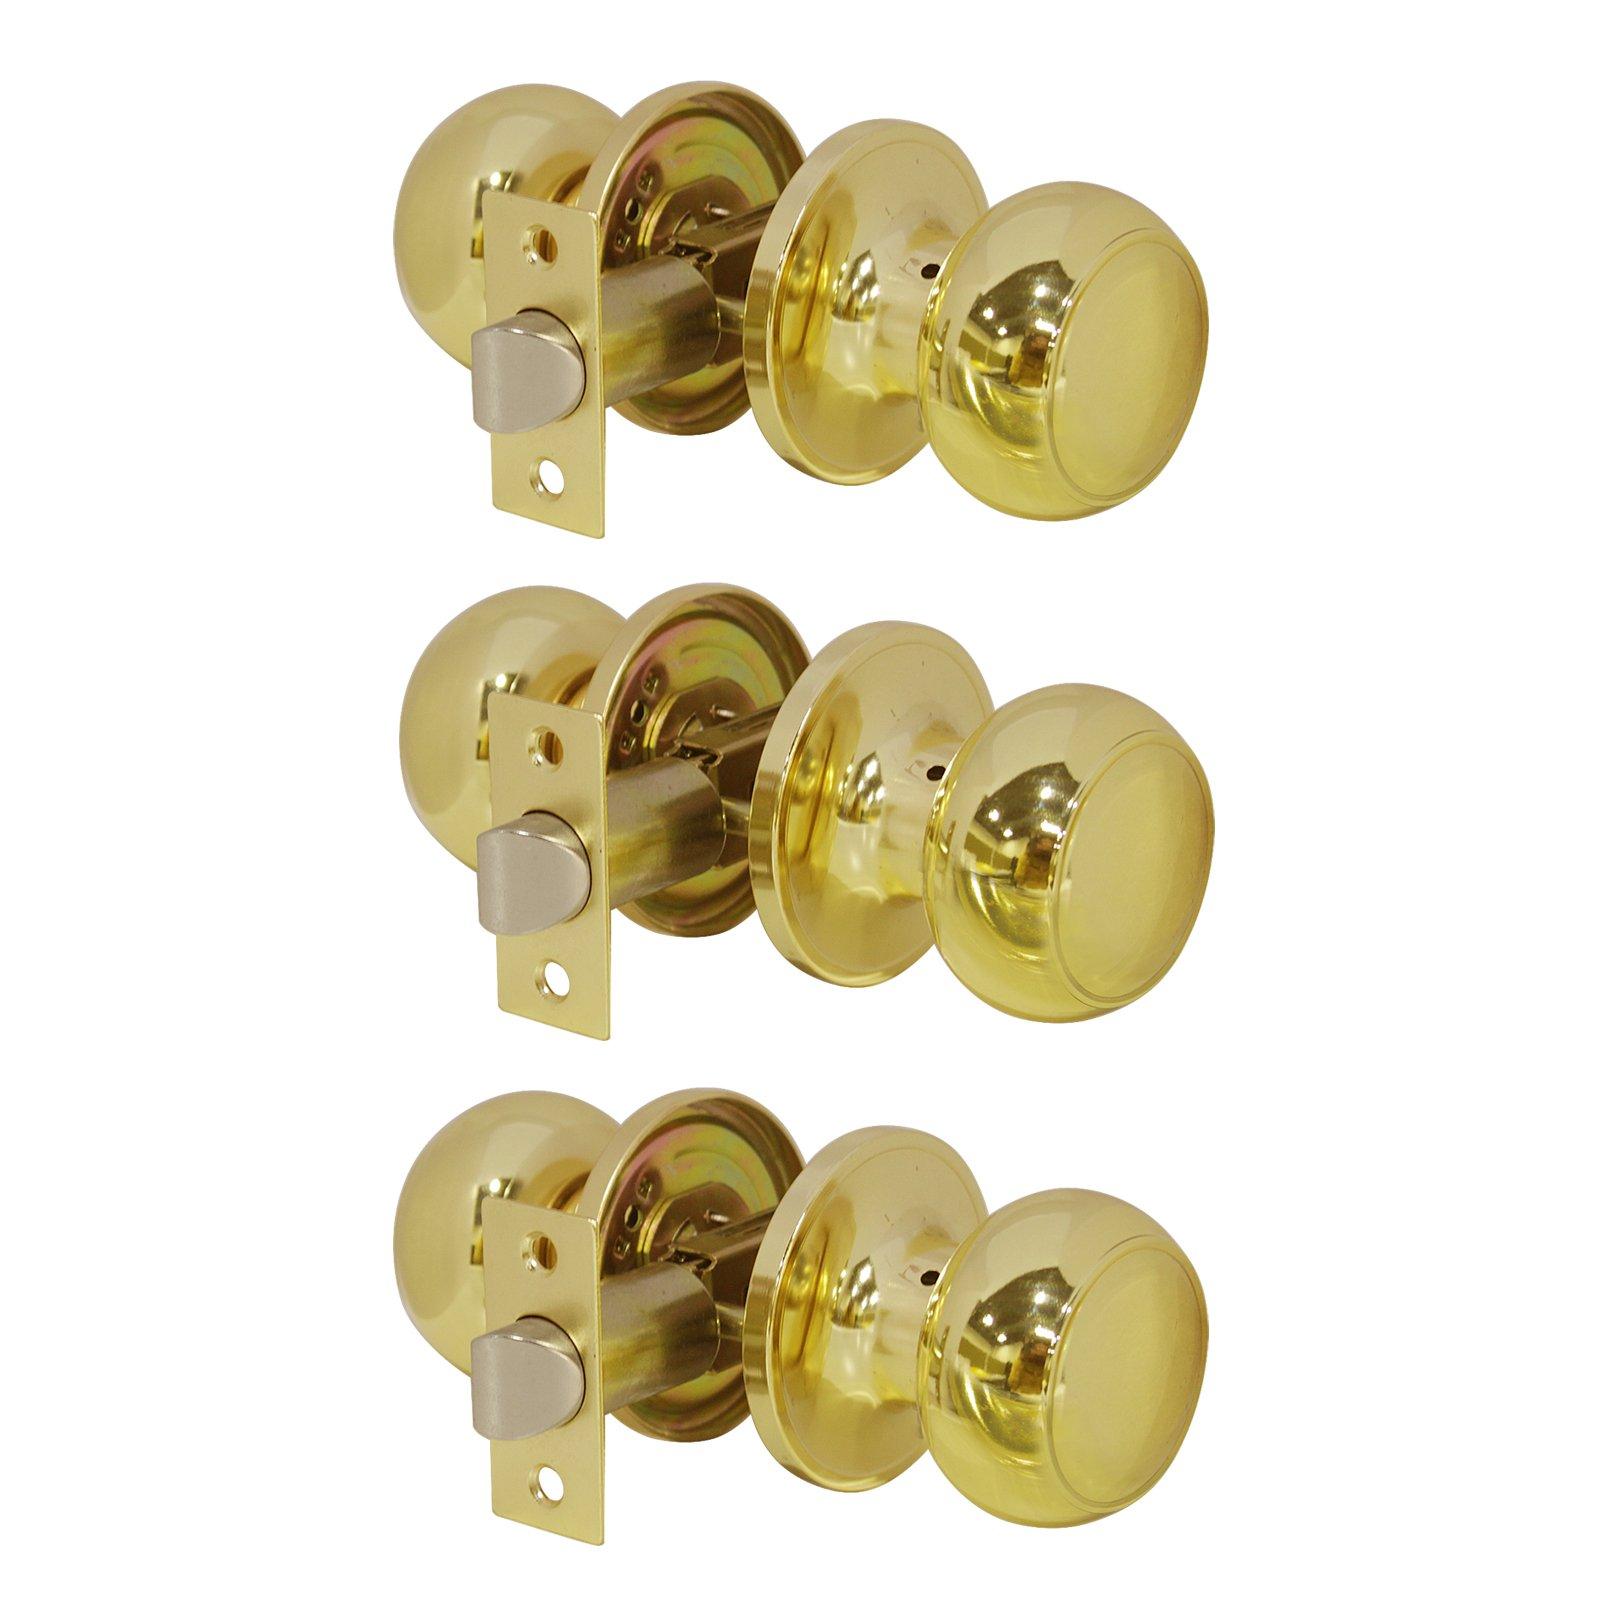 Probrico Entrance Door Knobs Door Lock Keyed Alike Lockset Polished Brass Same Key Round Ball Entry Door Knobs Pack of 3